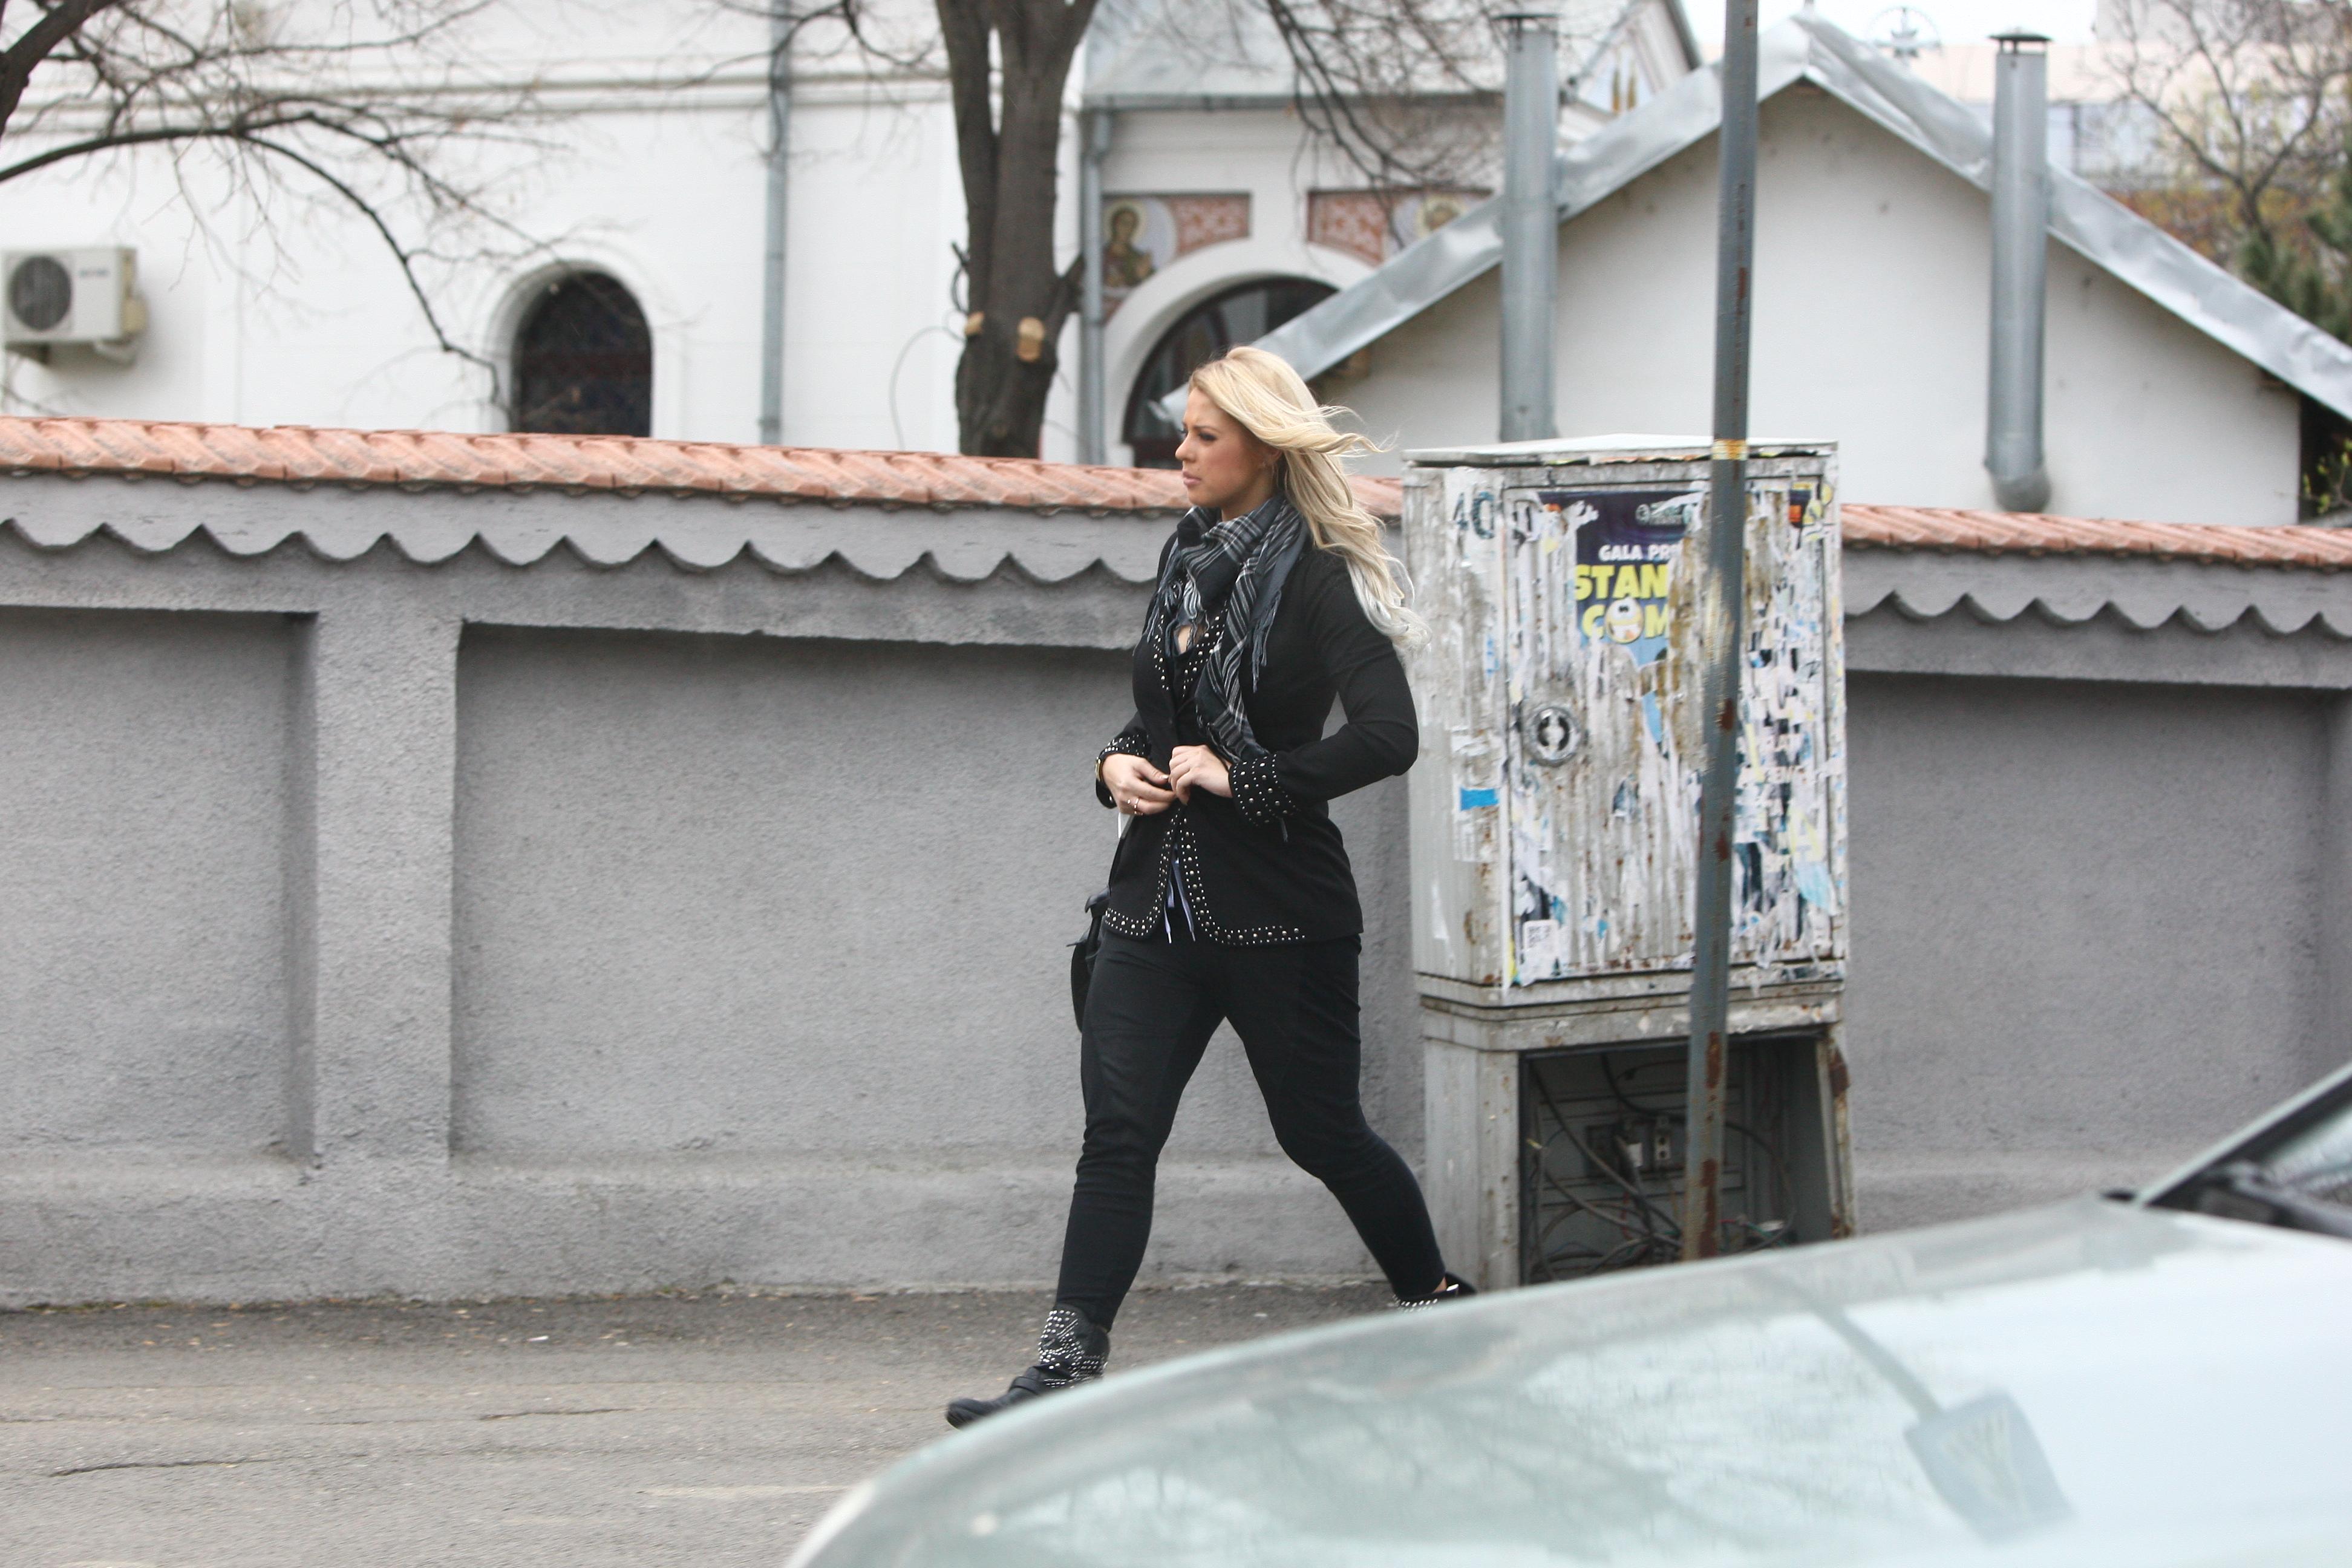 Blonda cobora suparata si pleaca de langa masina